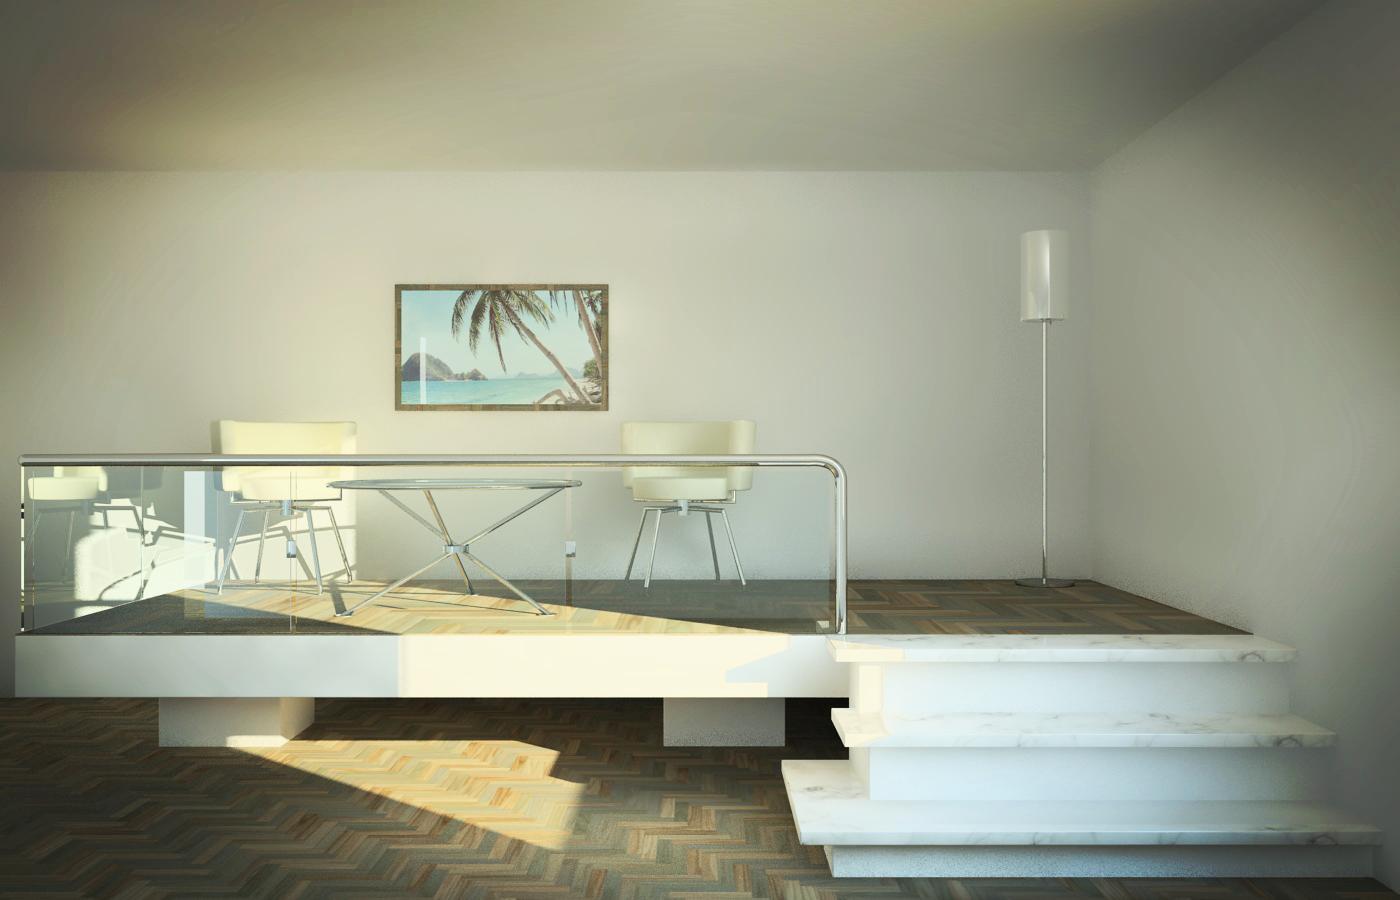 Interior free download joy studio design gallery best for Vray interior